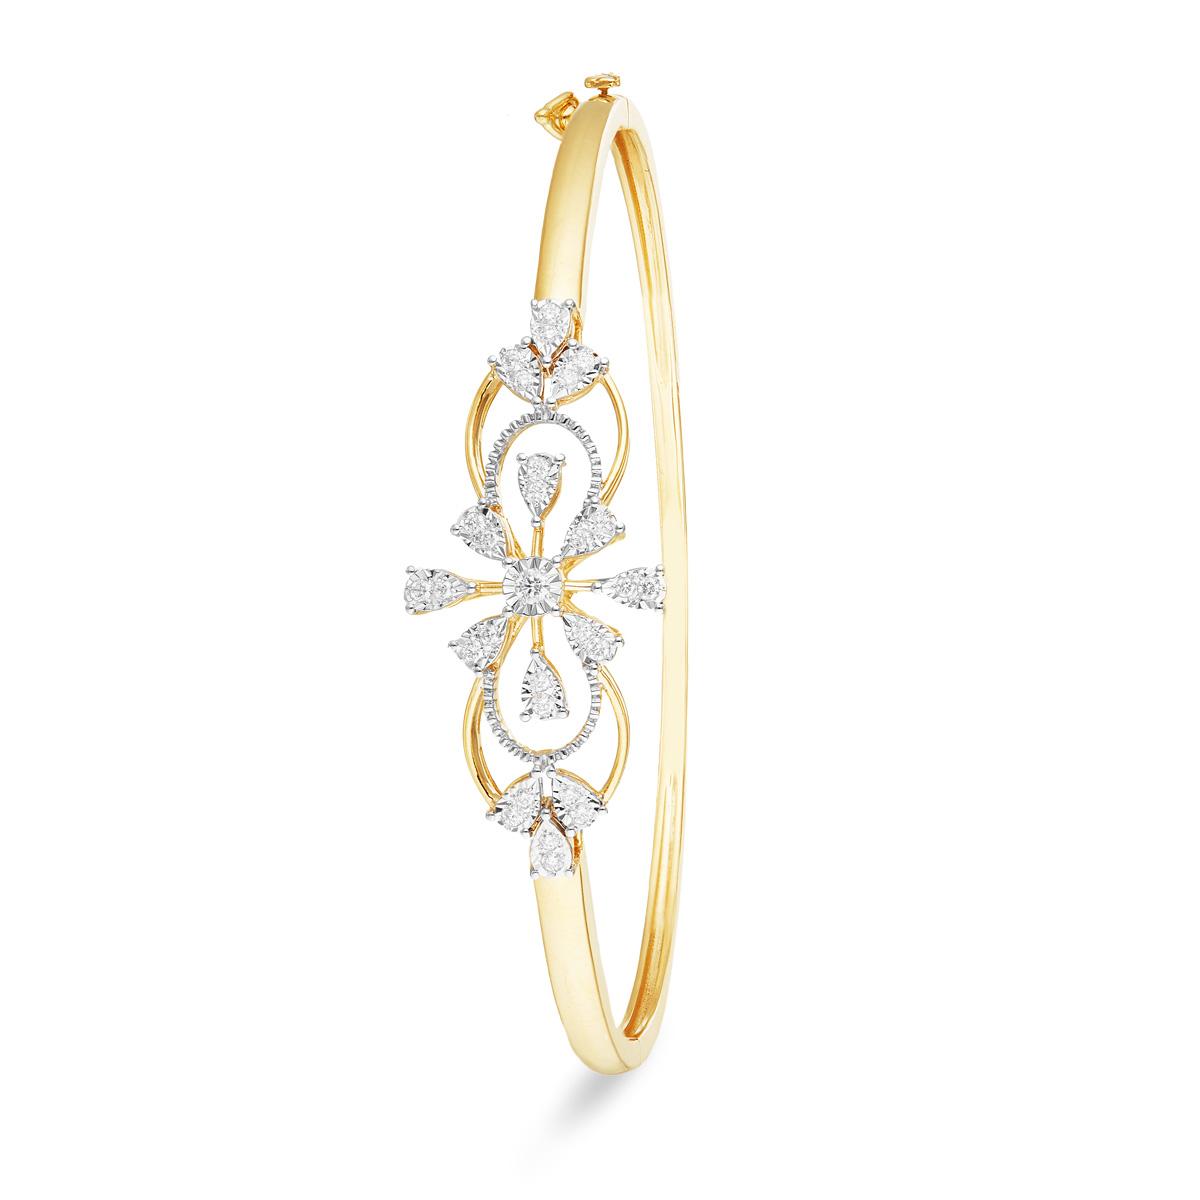 Floral Infinity bracelet